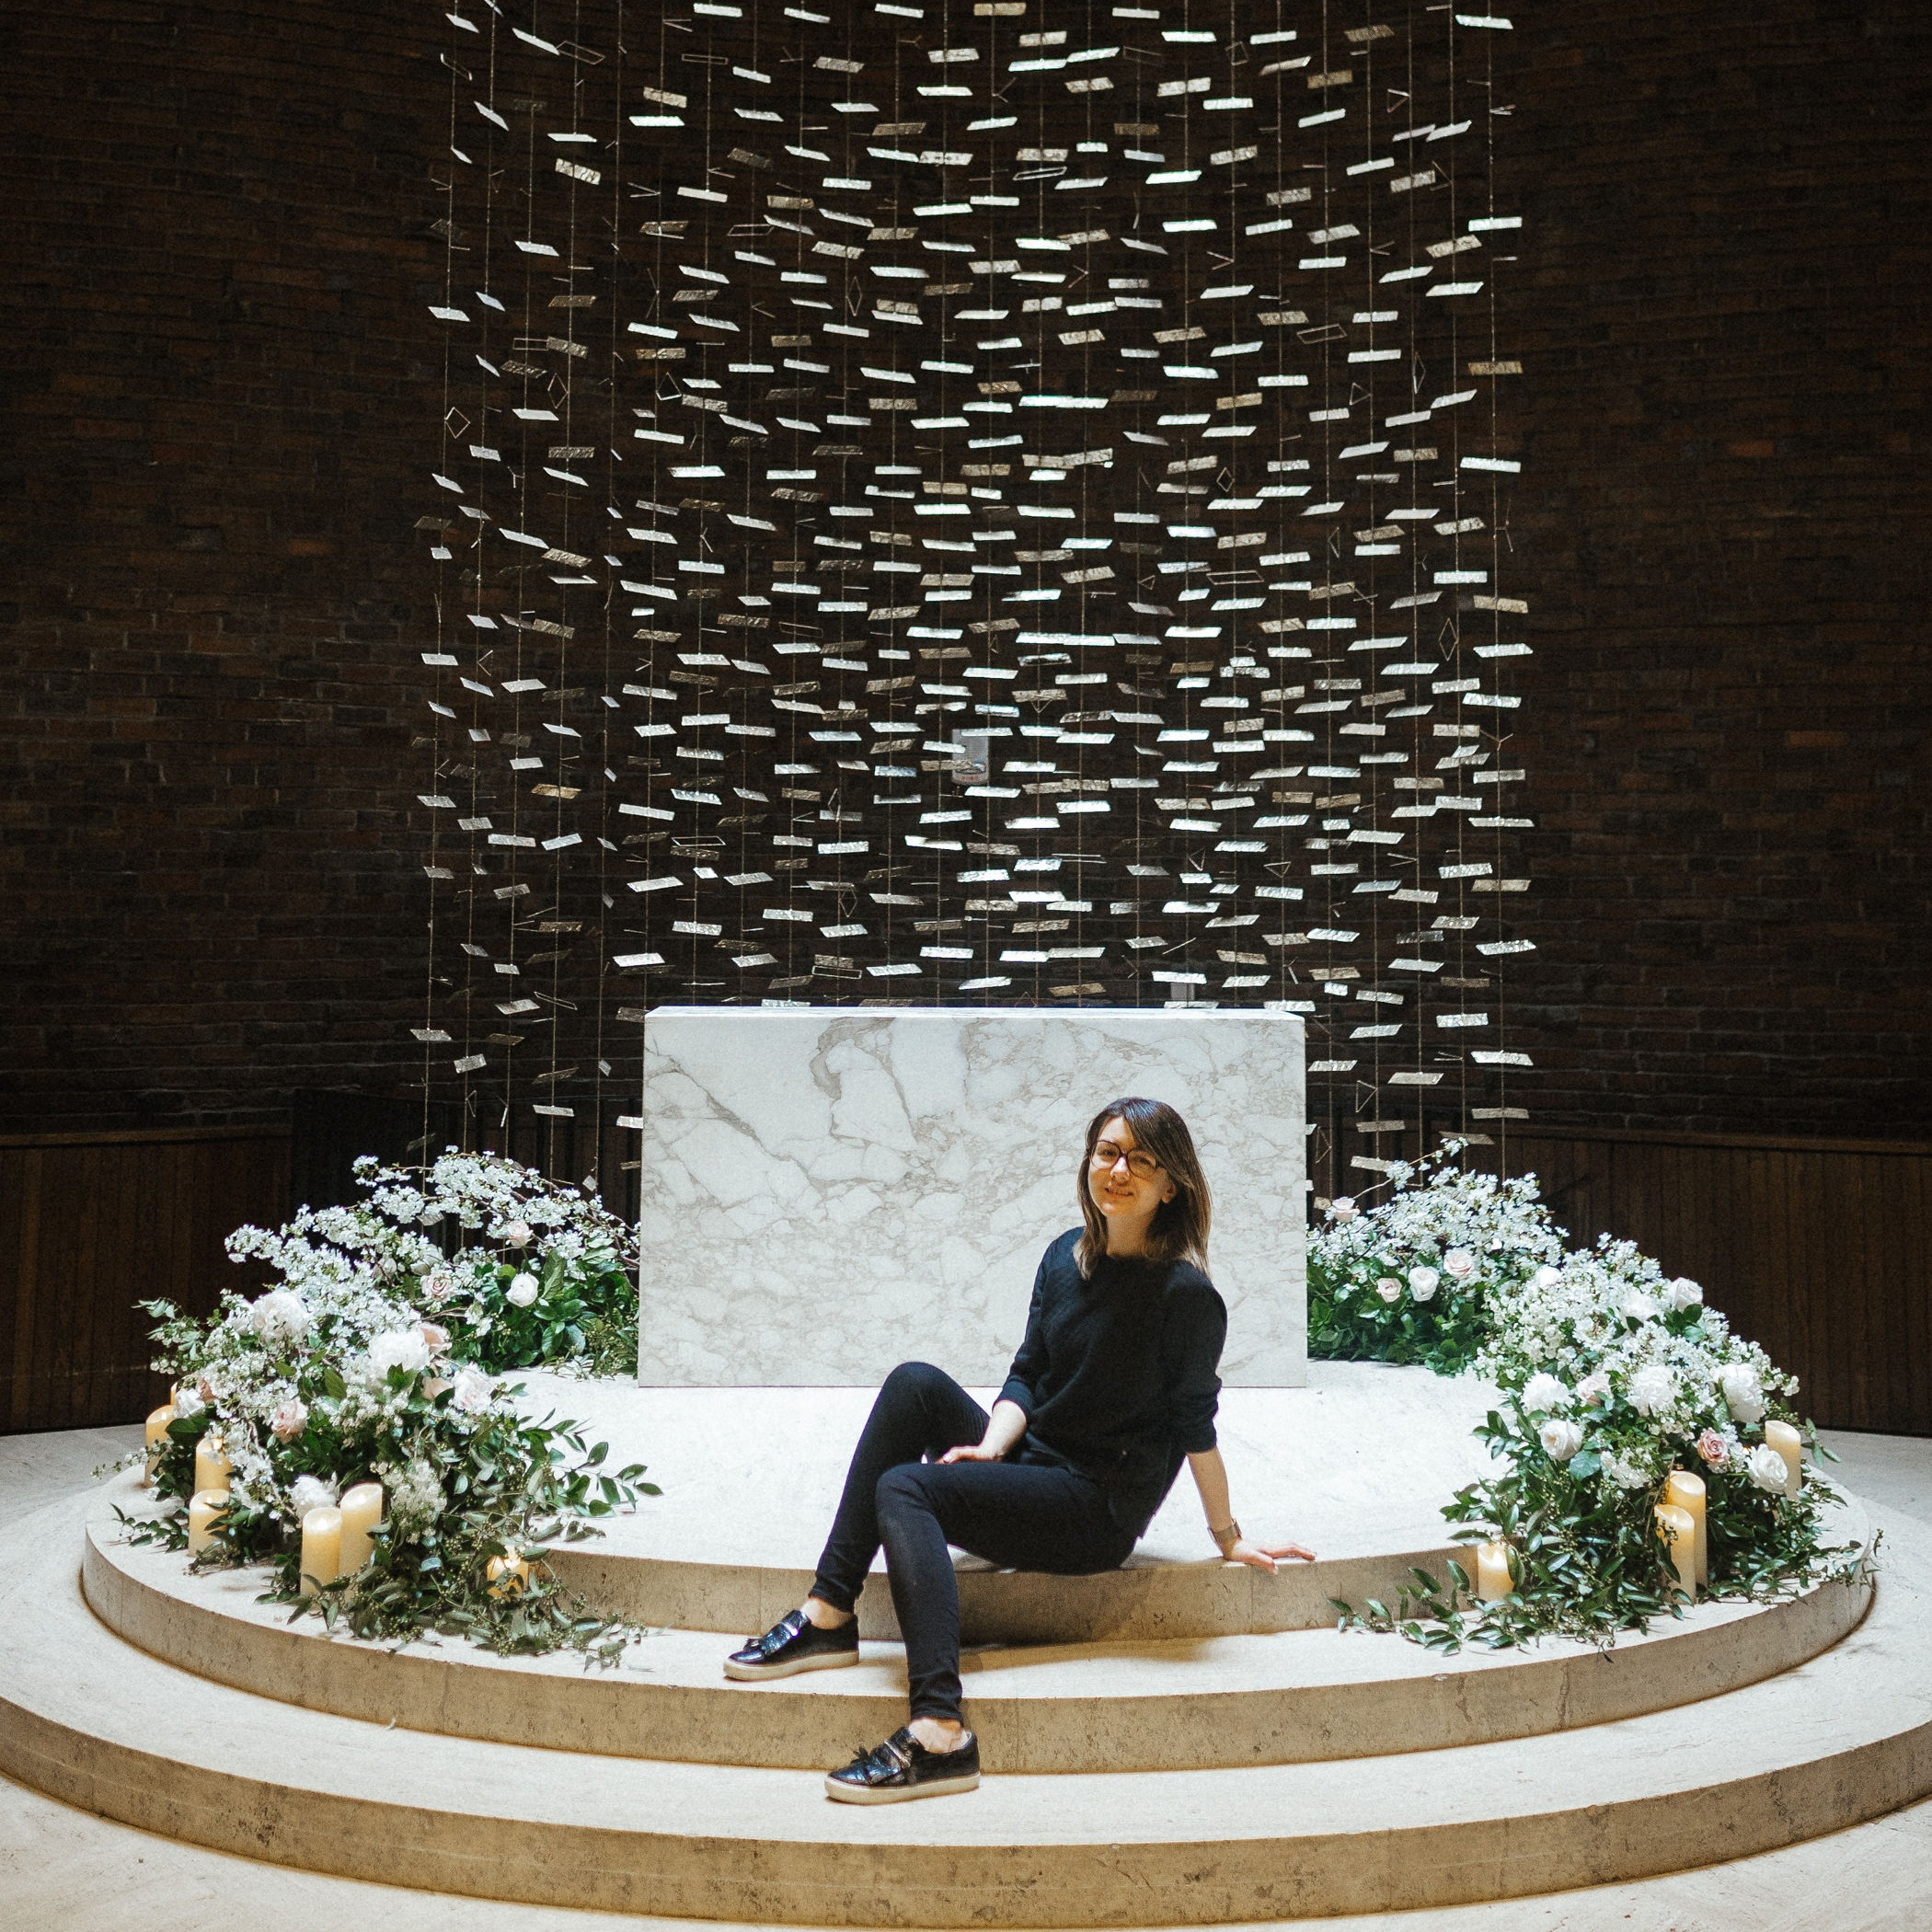 Kseniya Khromina, Owner and Lead Designer at Floristika Studio LLC